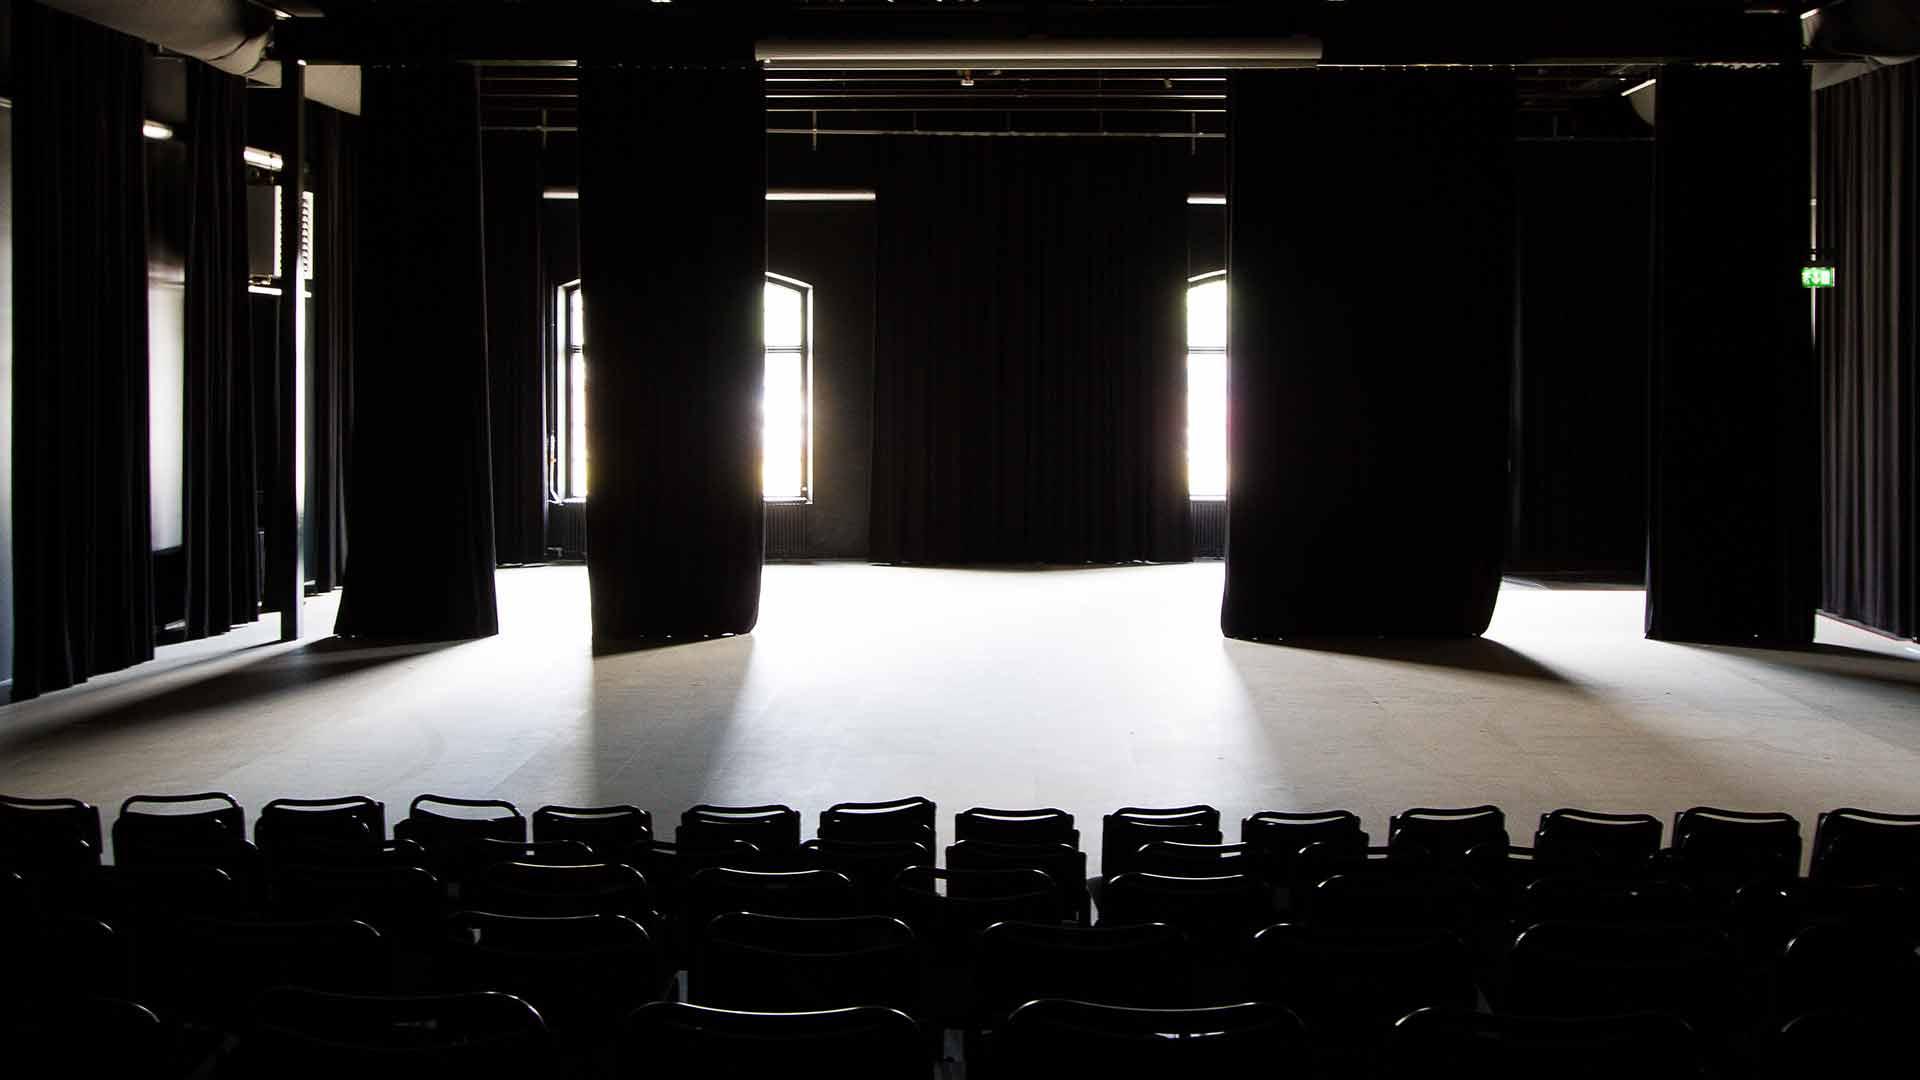 Regionteatern. Lokstallarna